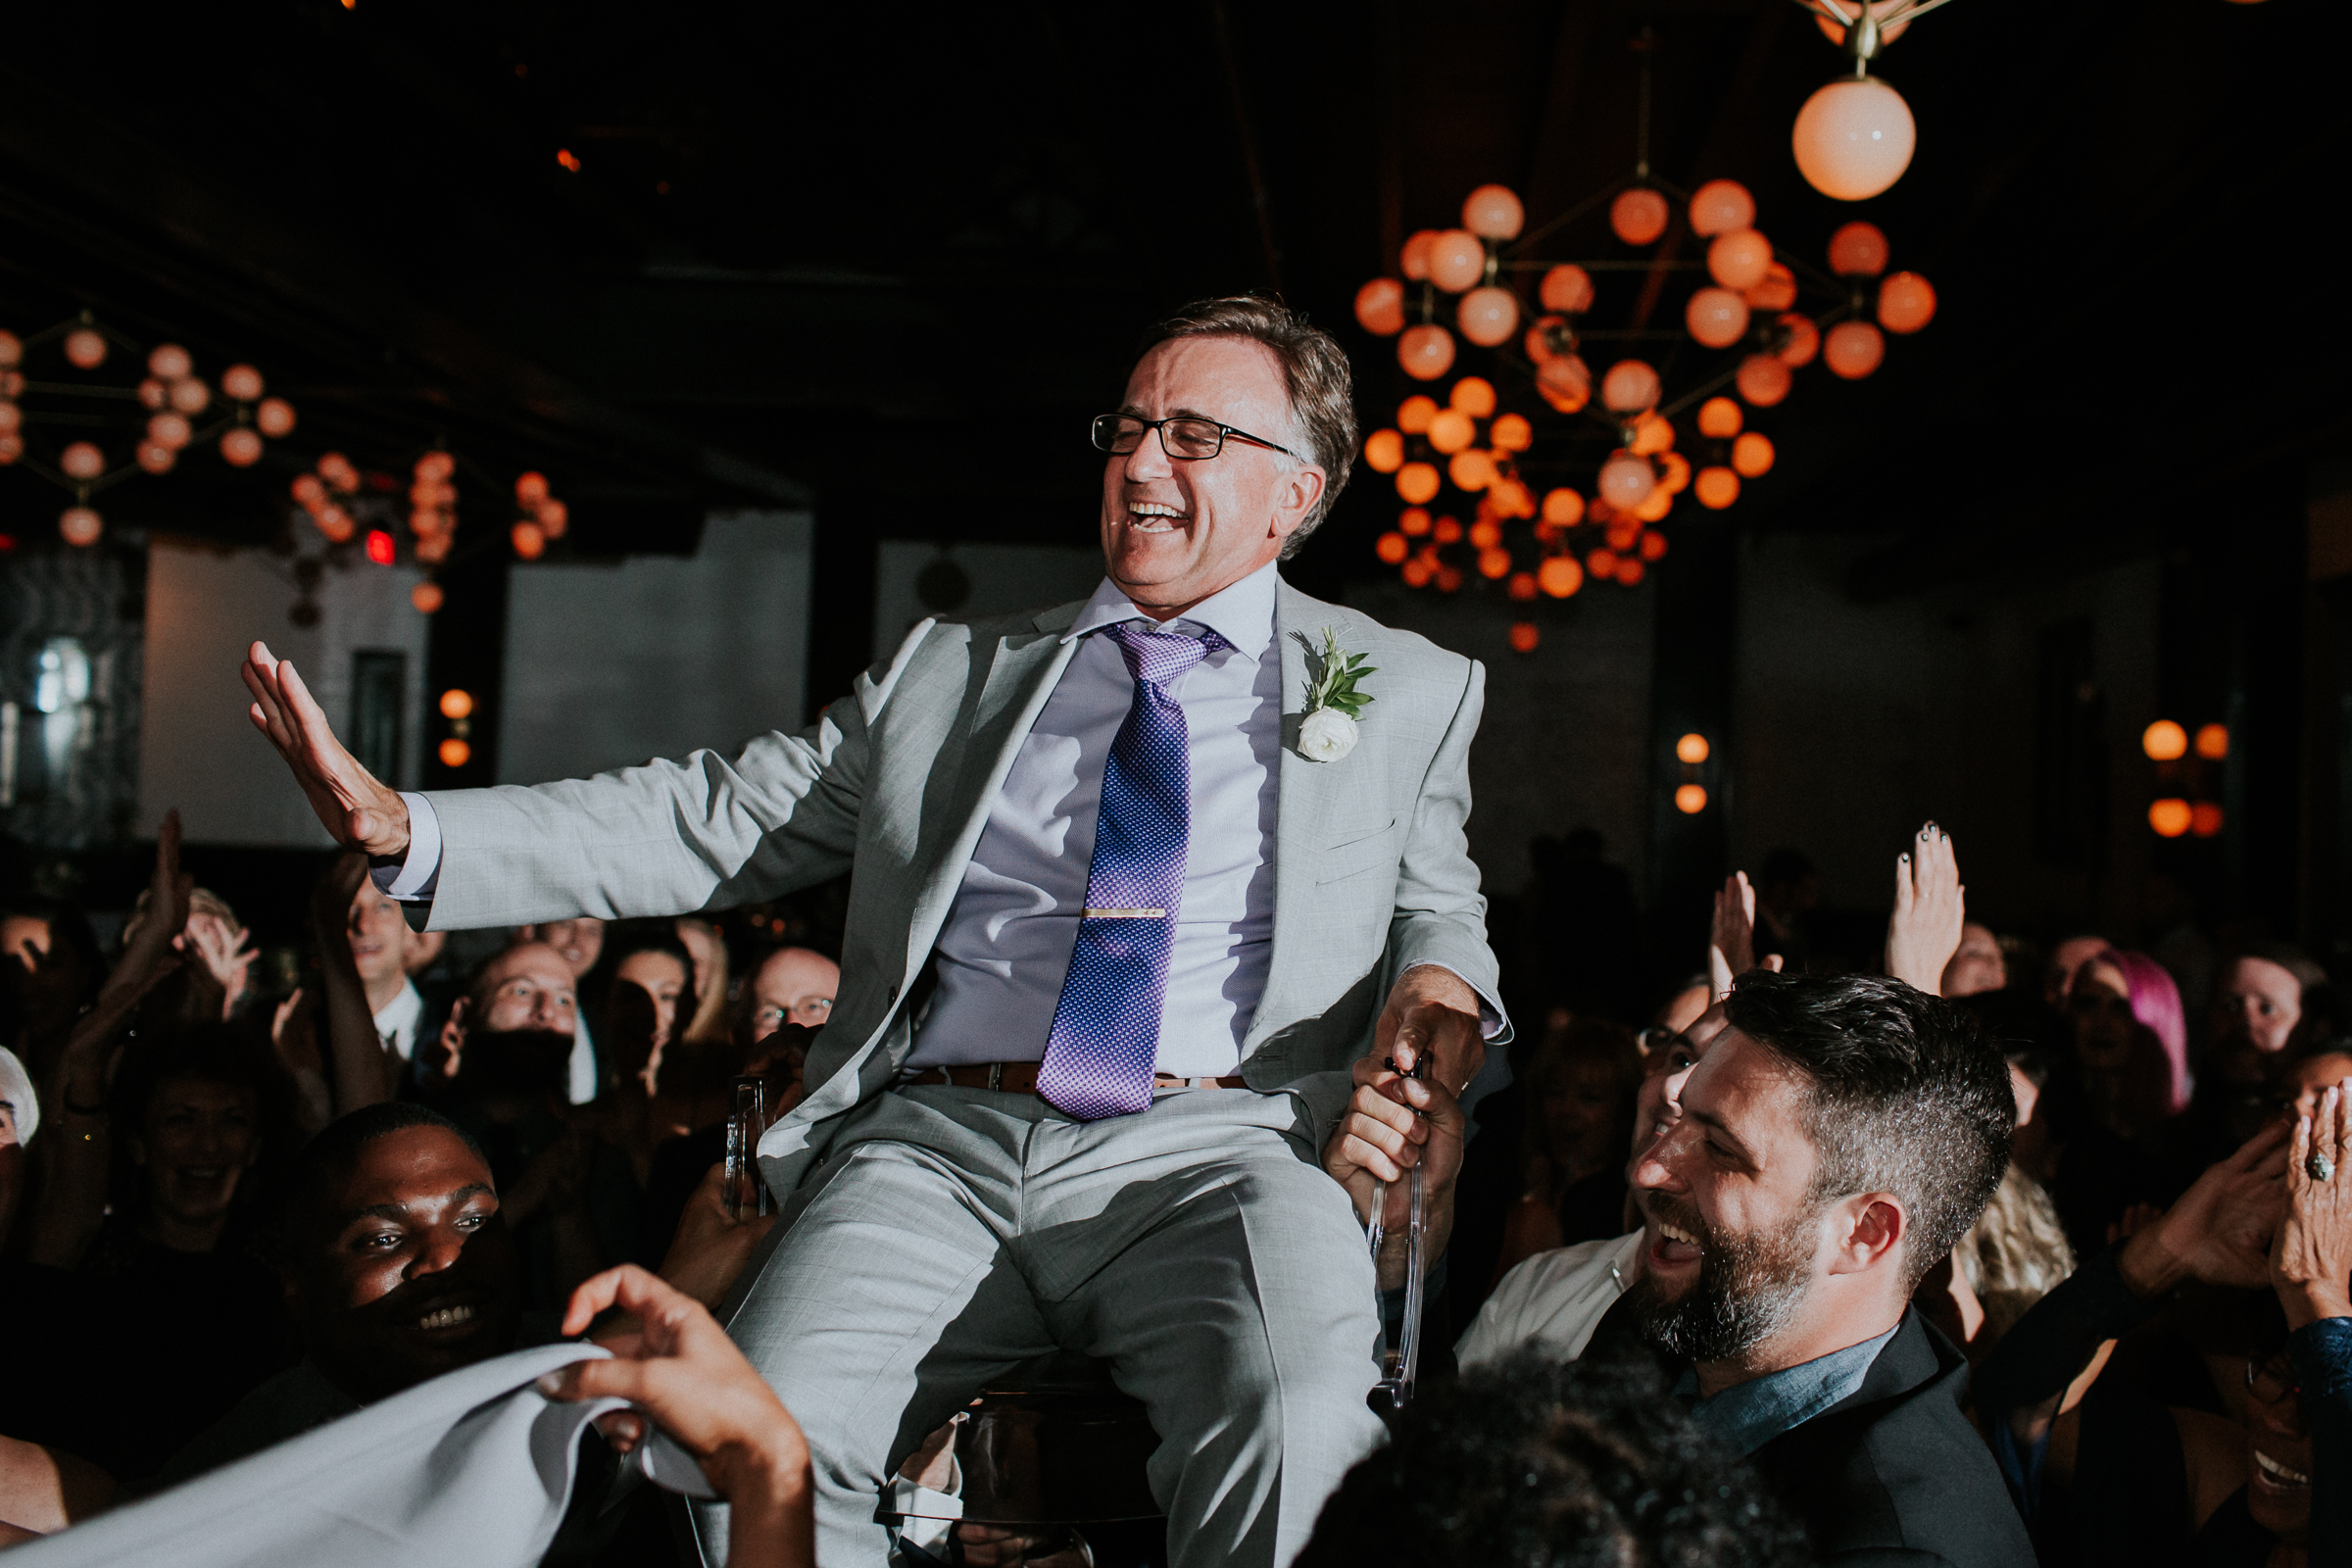 501-Union-Brooklyn-Fine-Art-Documentary-Wedding-Photographer-140.jpg